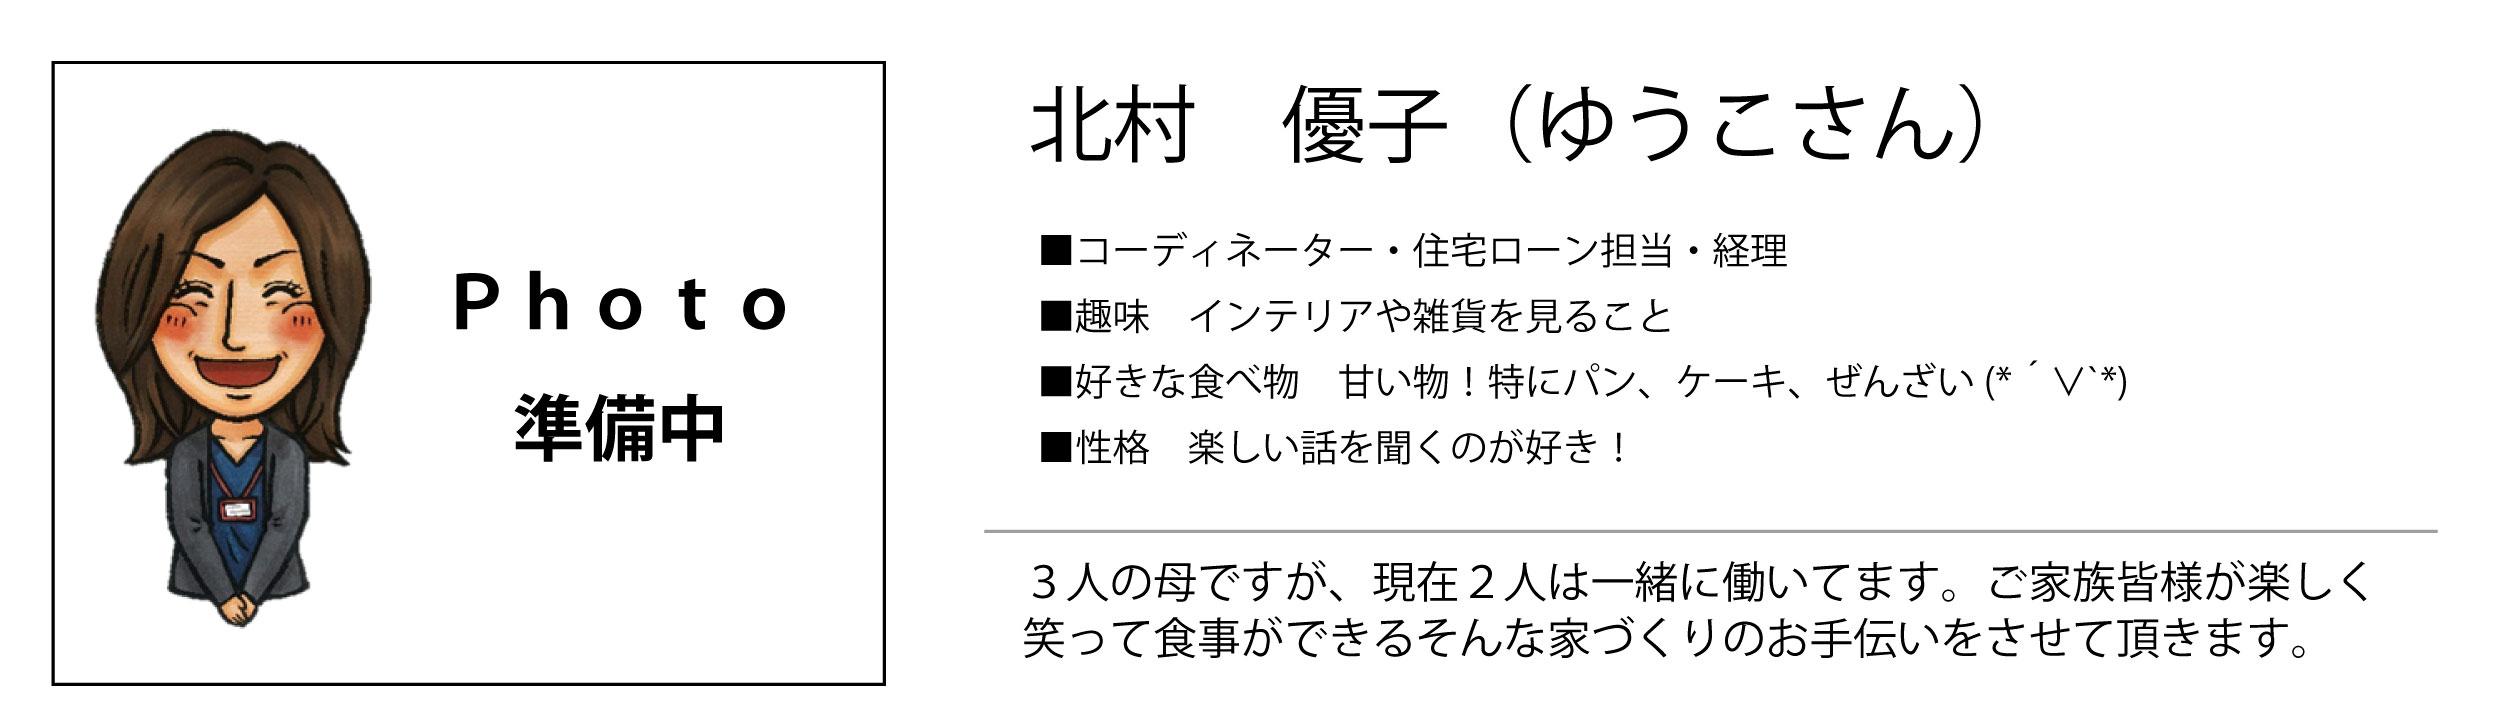 staff-yuko.k.jpg